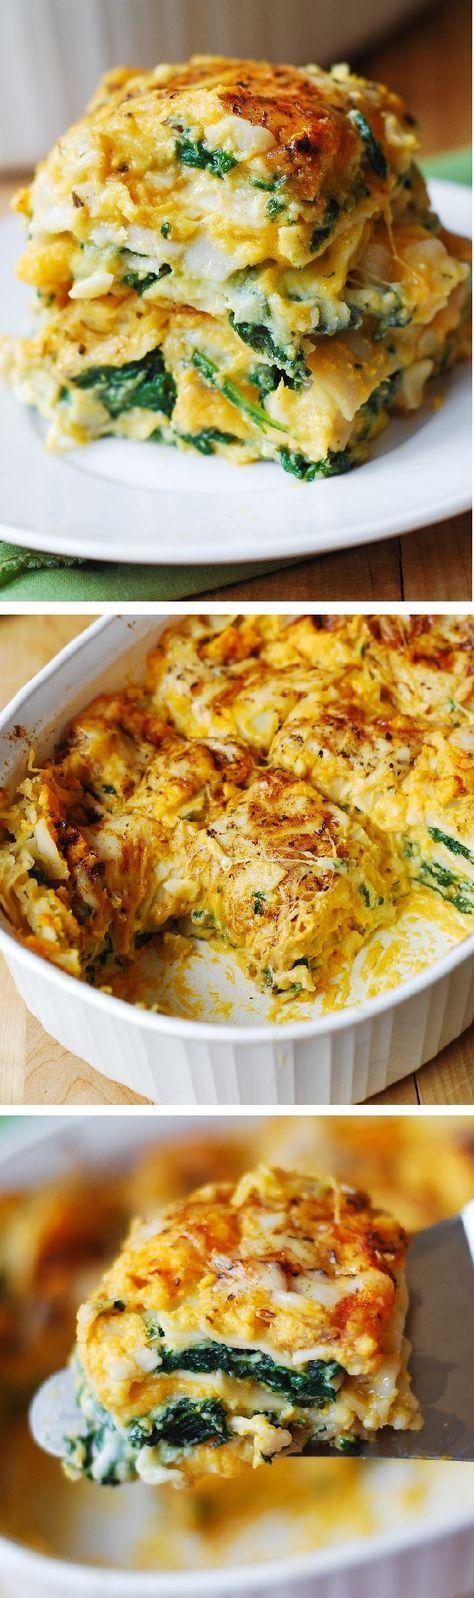 Butternut Squash and Spinach Three Cheese Lasagna - Healthy, vegetarian, gluten-free friendly recipe.